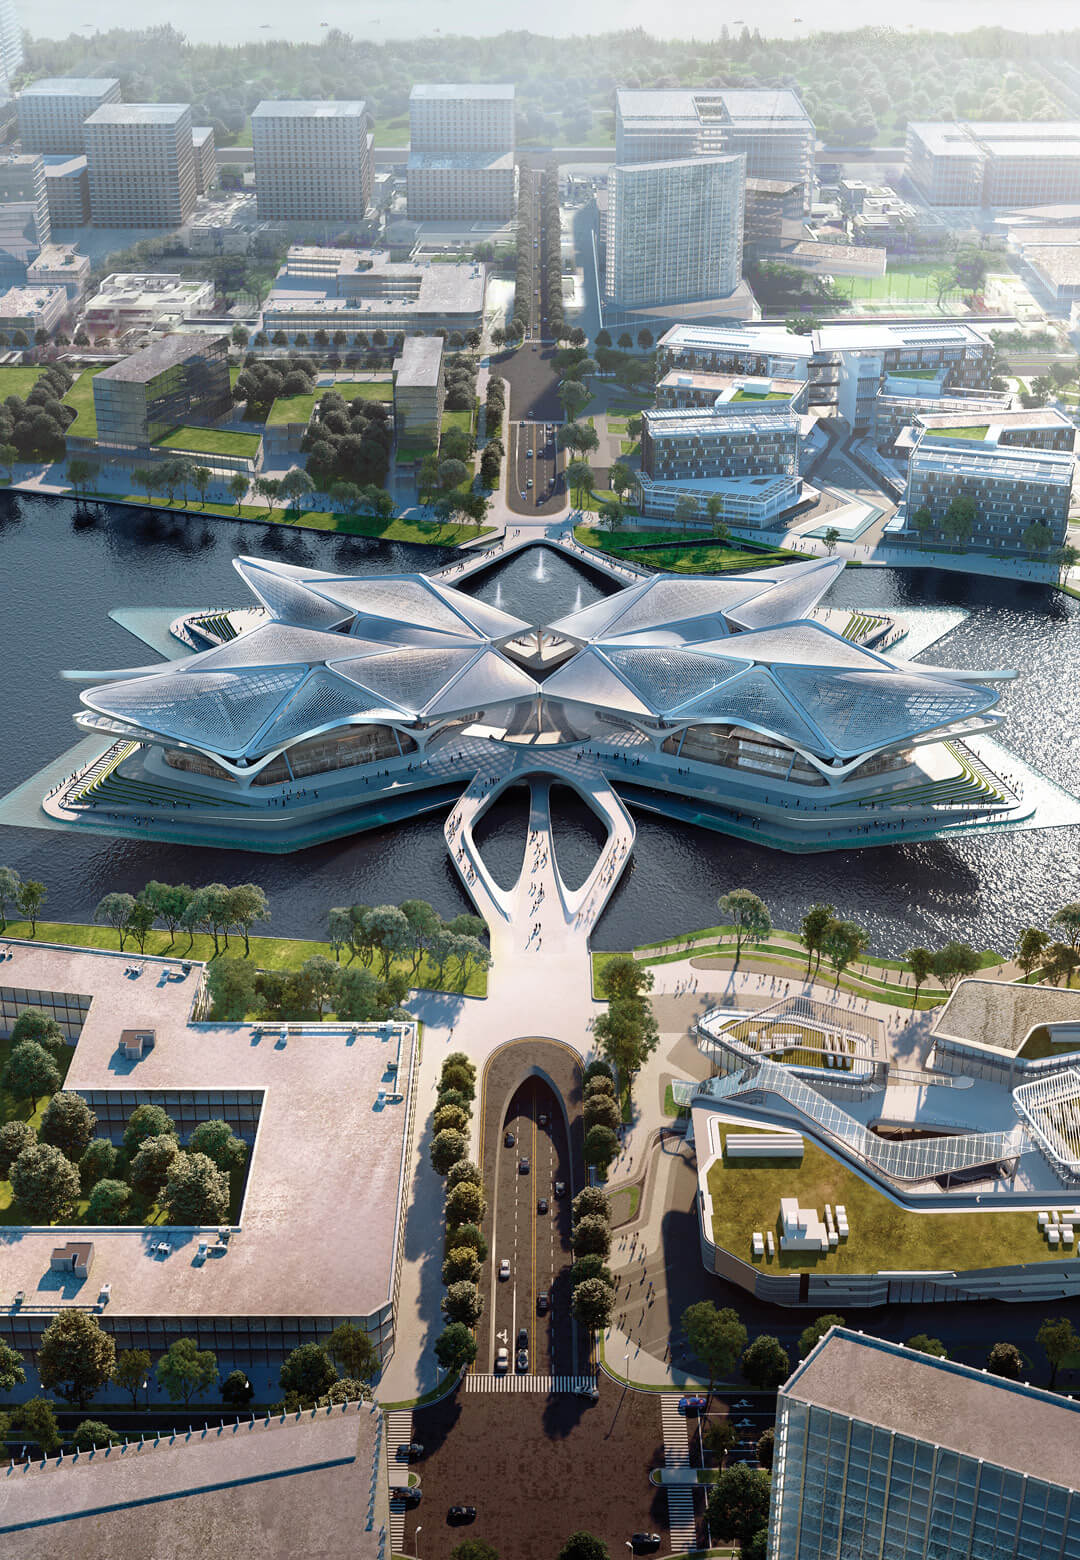 The Zhuhai Jinwan Civic Art Centre | Zhuhai Jinwan Civic Art Centre | Zaha Hadid Architects | STIRworld